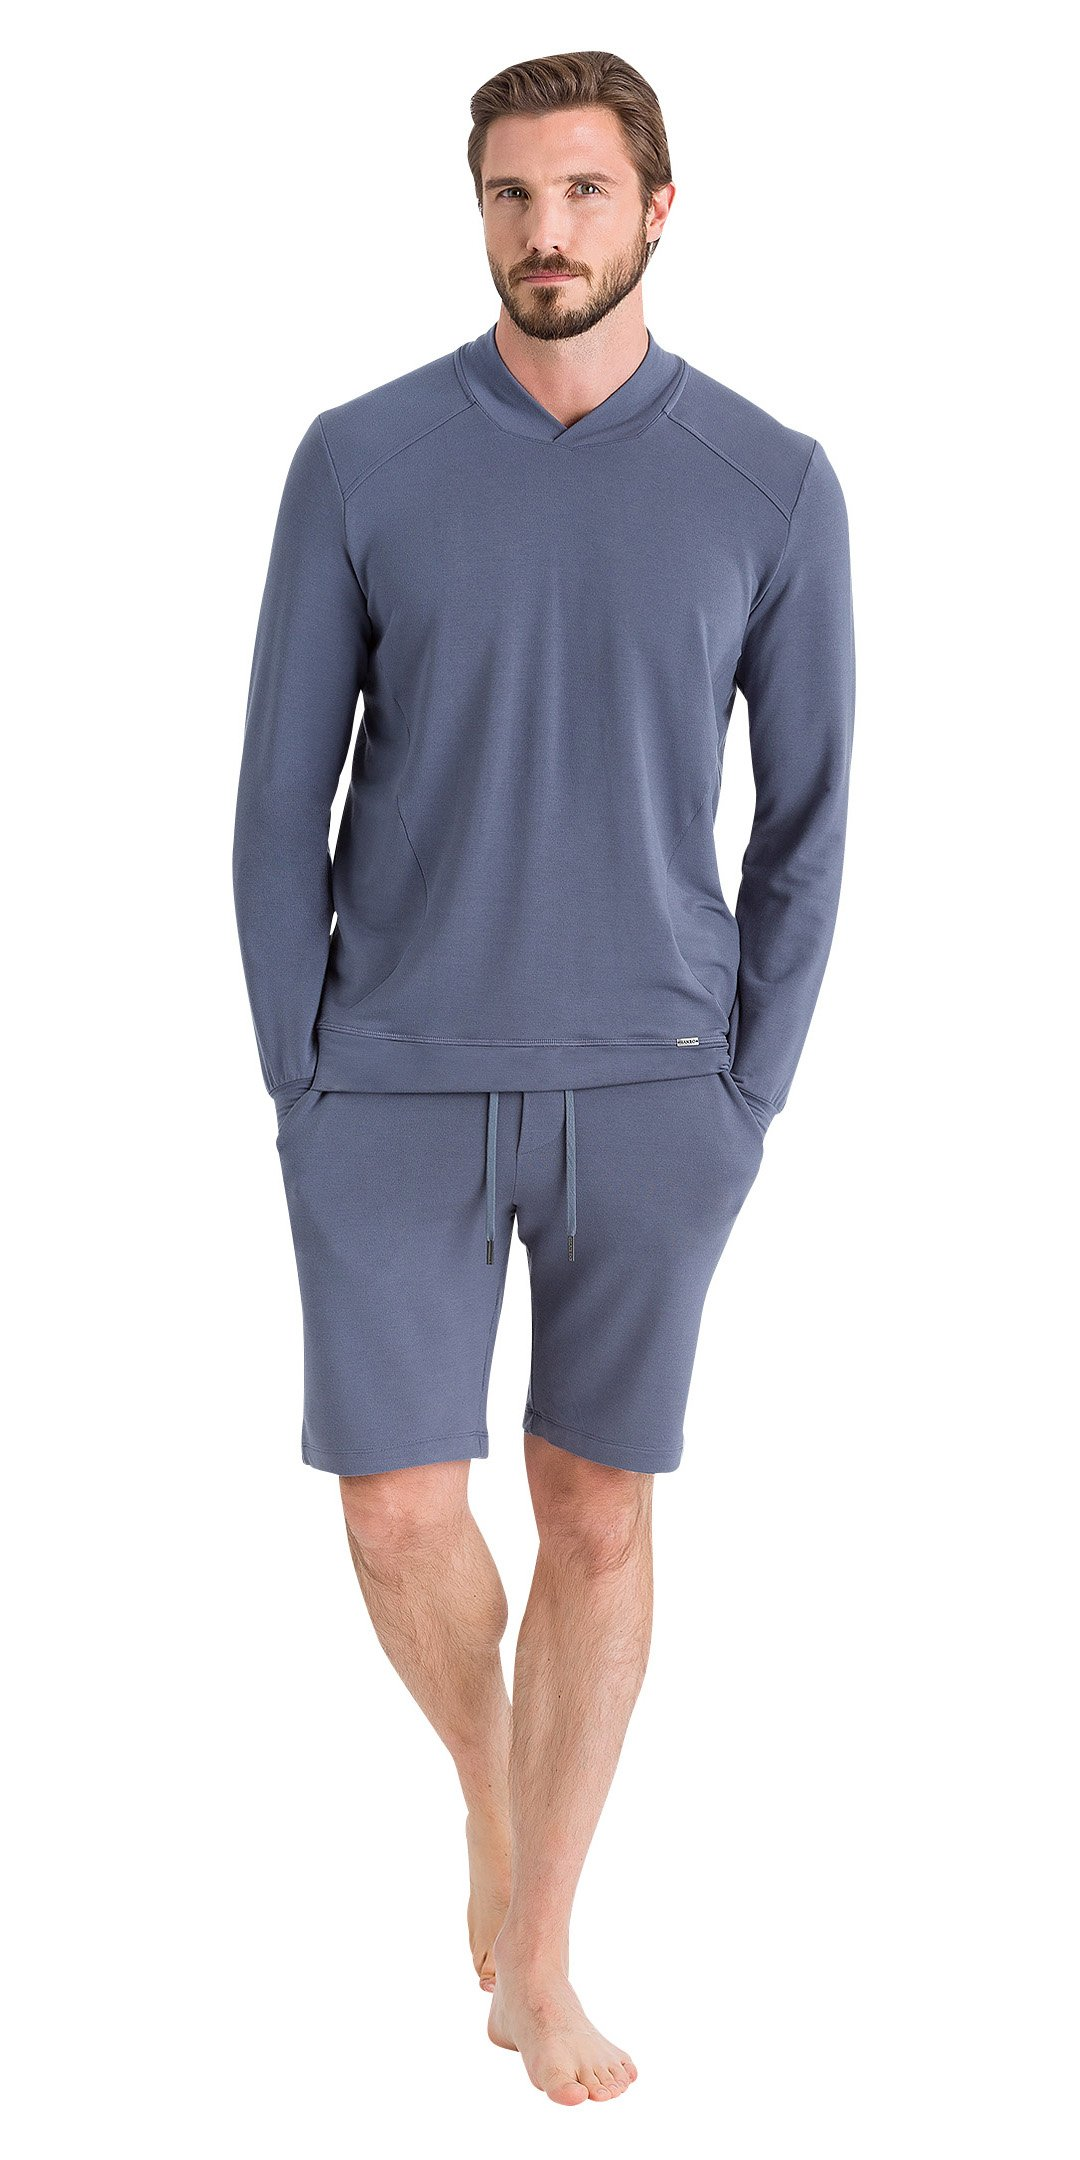 HANRO Men's Living Relax Shorts, Slate Grey, X-Large by HANRO (Image #1)